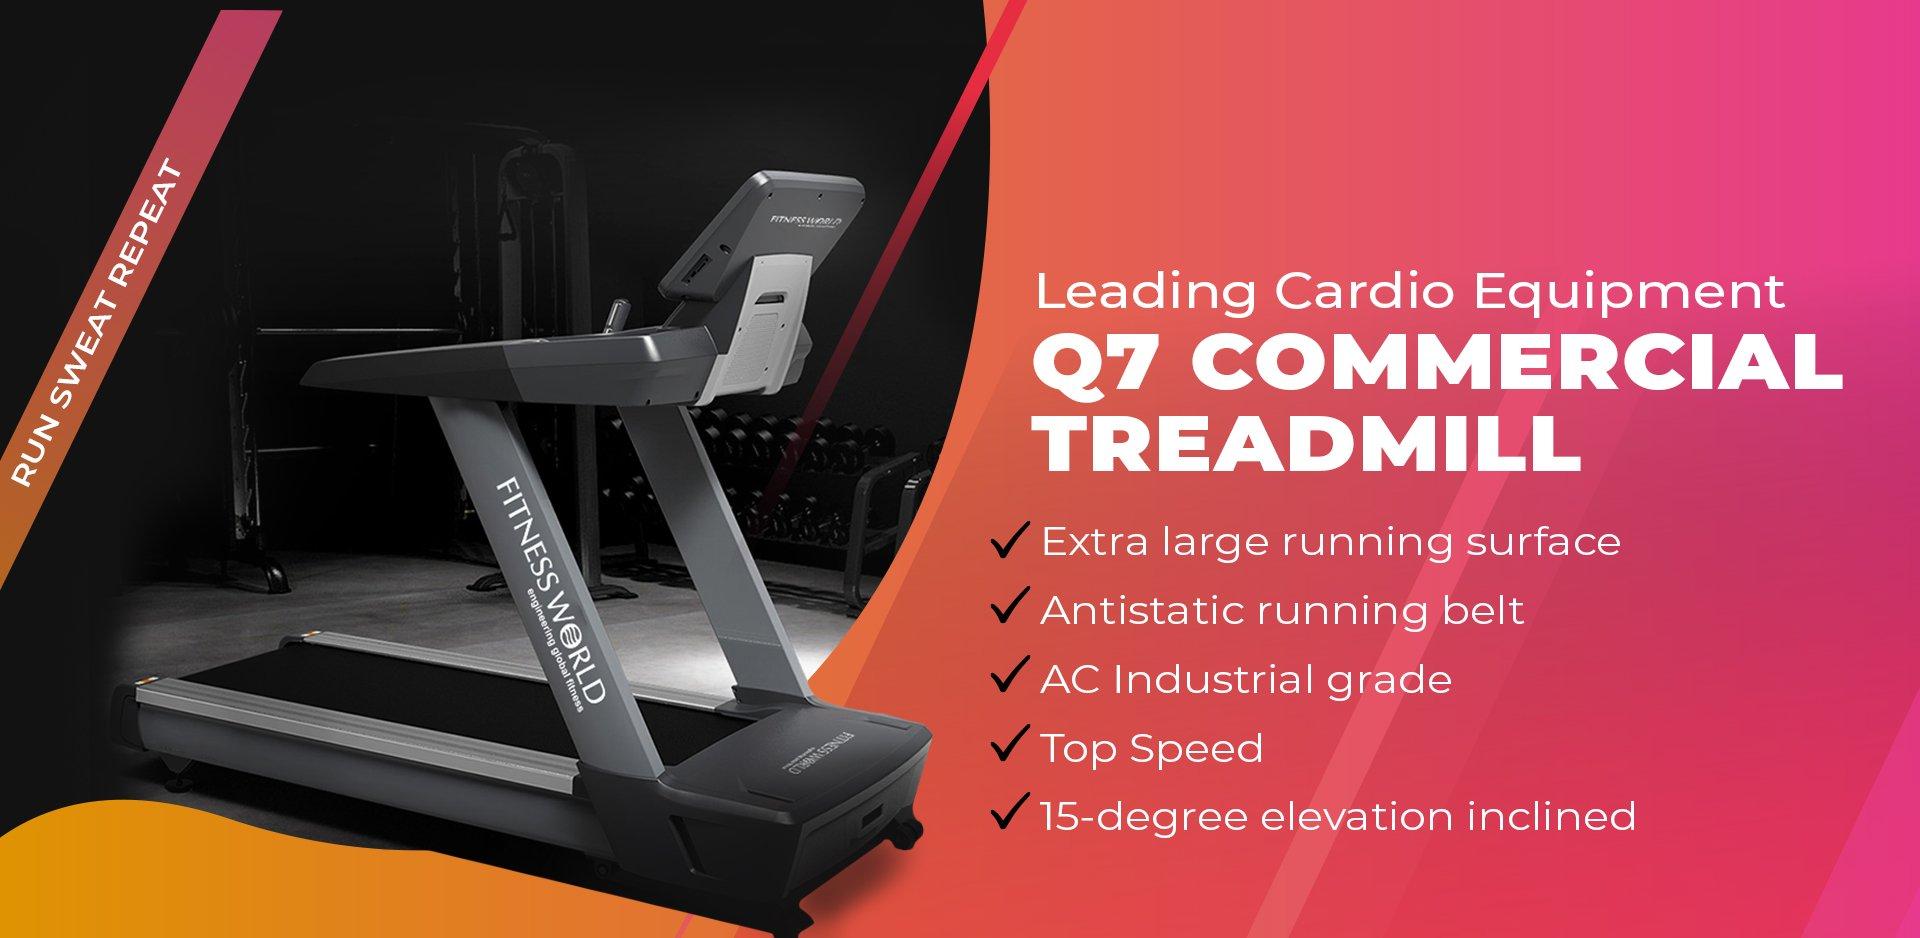 Q7 Commercial Treadmill Banner